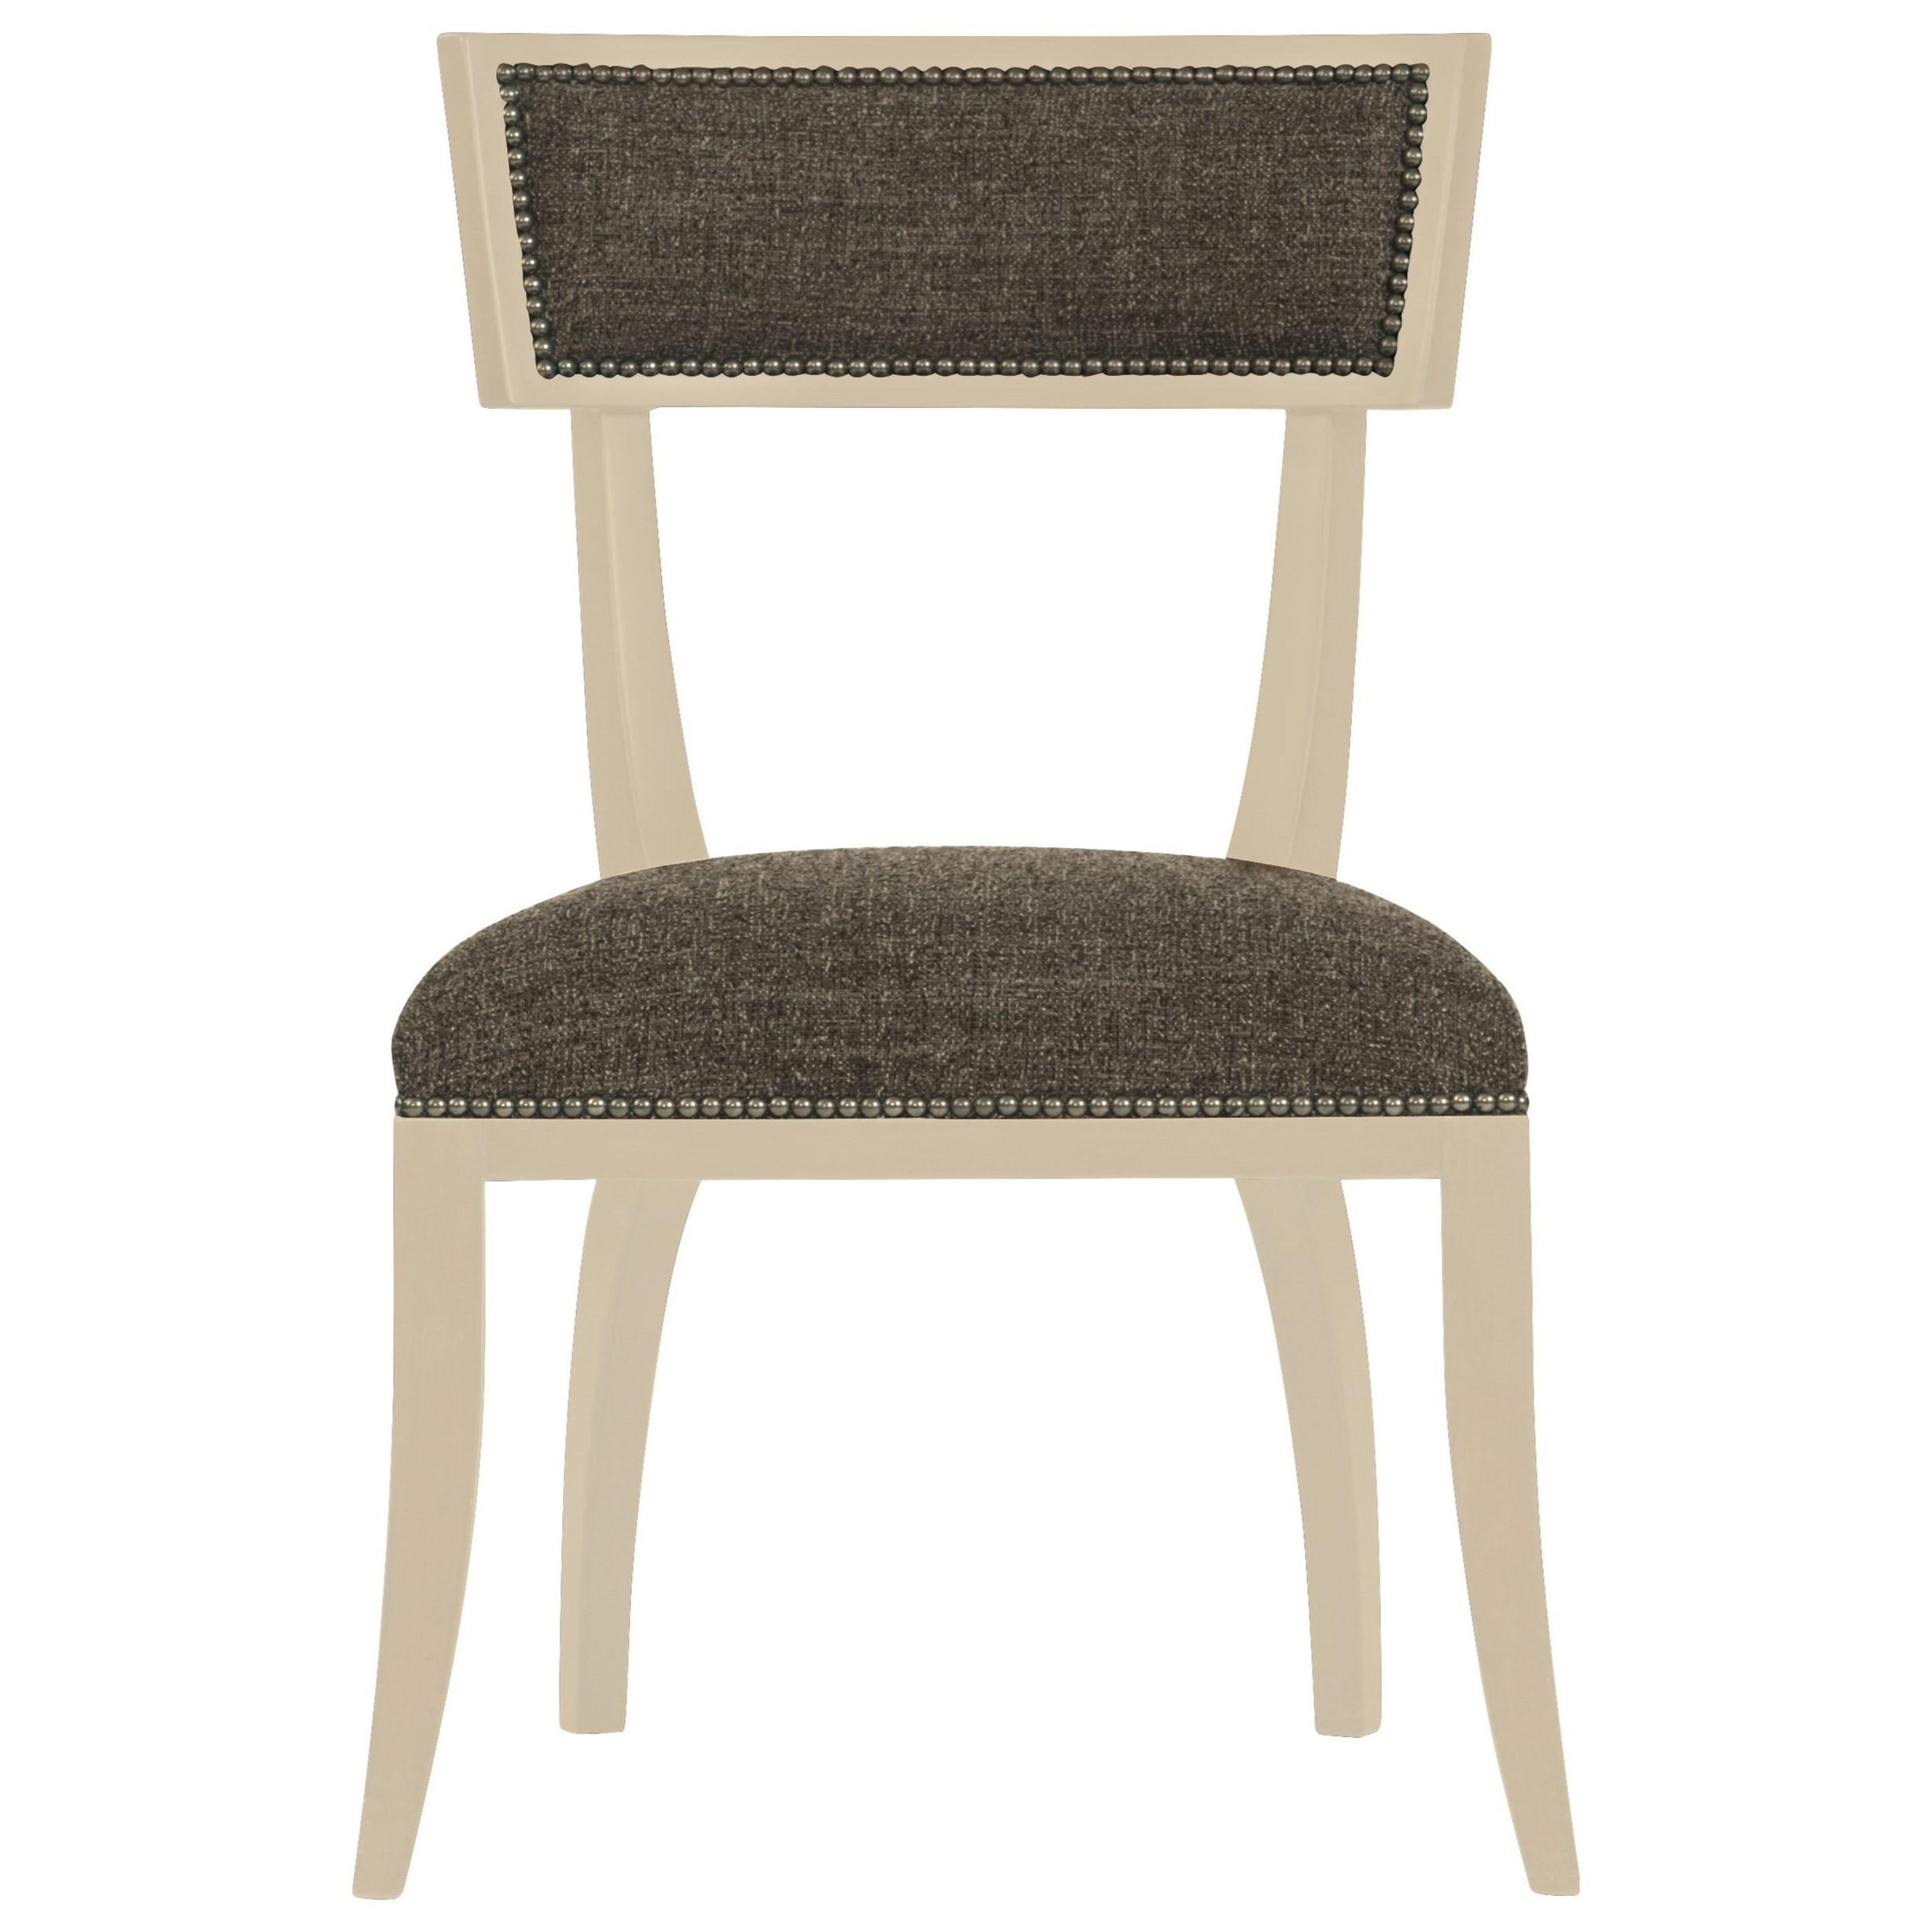 Bernhardt Interiors   Chairs Delancey Chair With Decorative Nail Trim